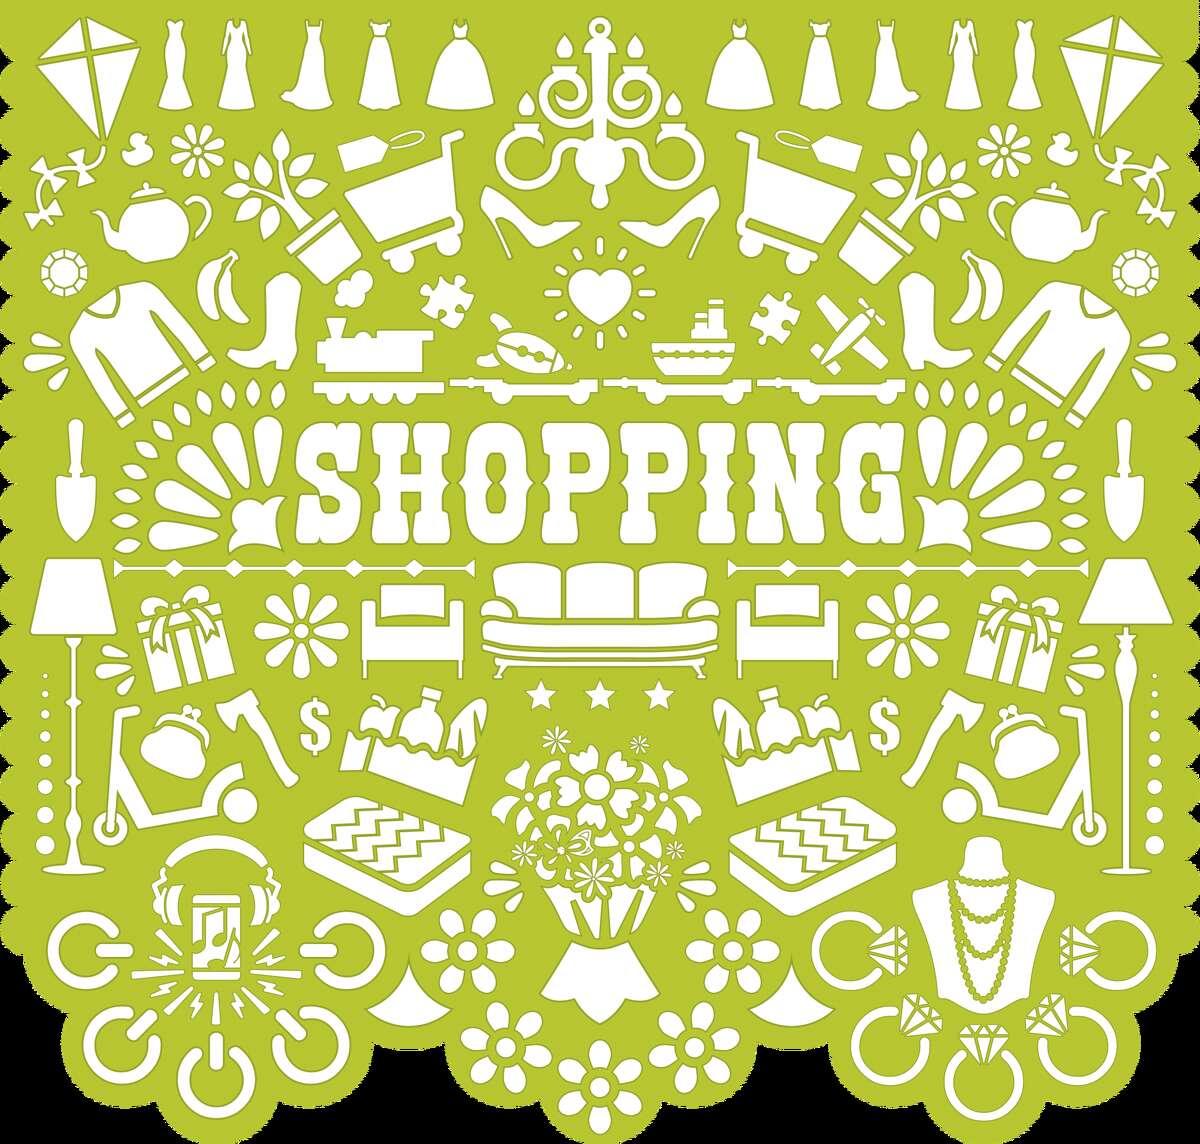 Shopping Fashion, Treasure and Trendy. Treasures, trinkets and treats that San Antonians Love